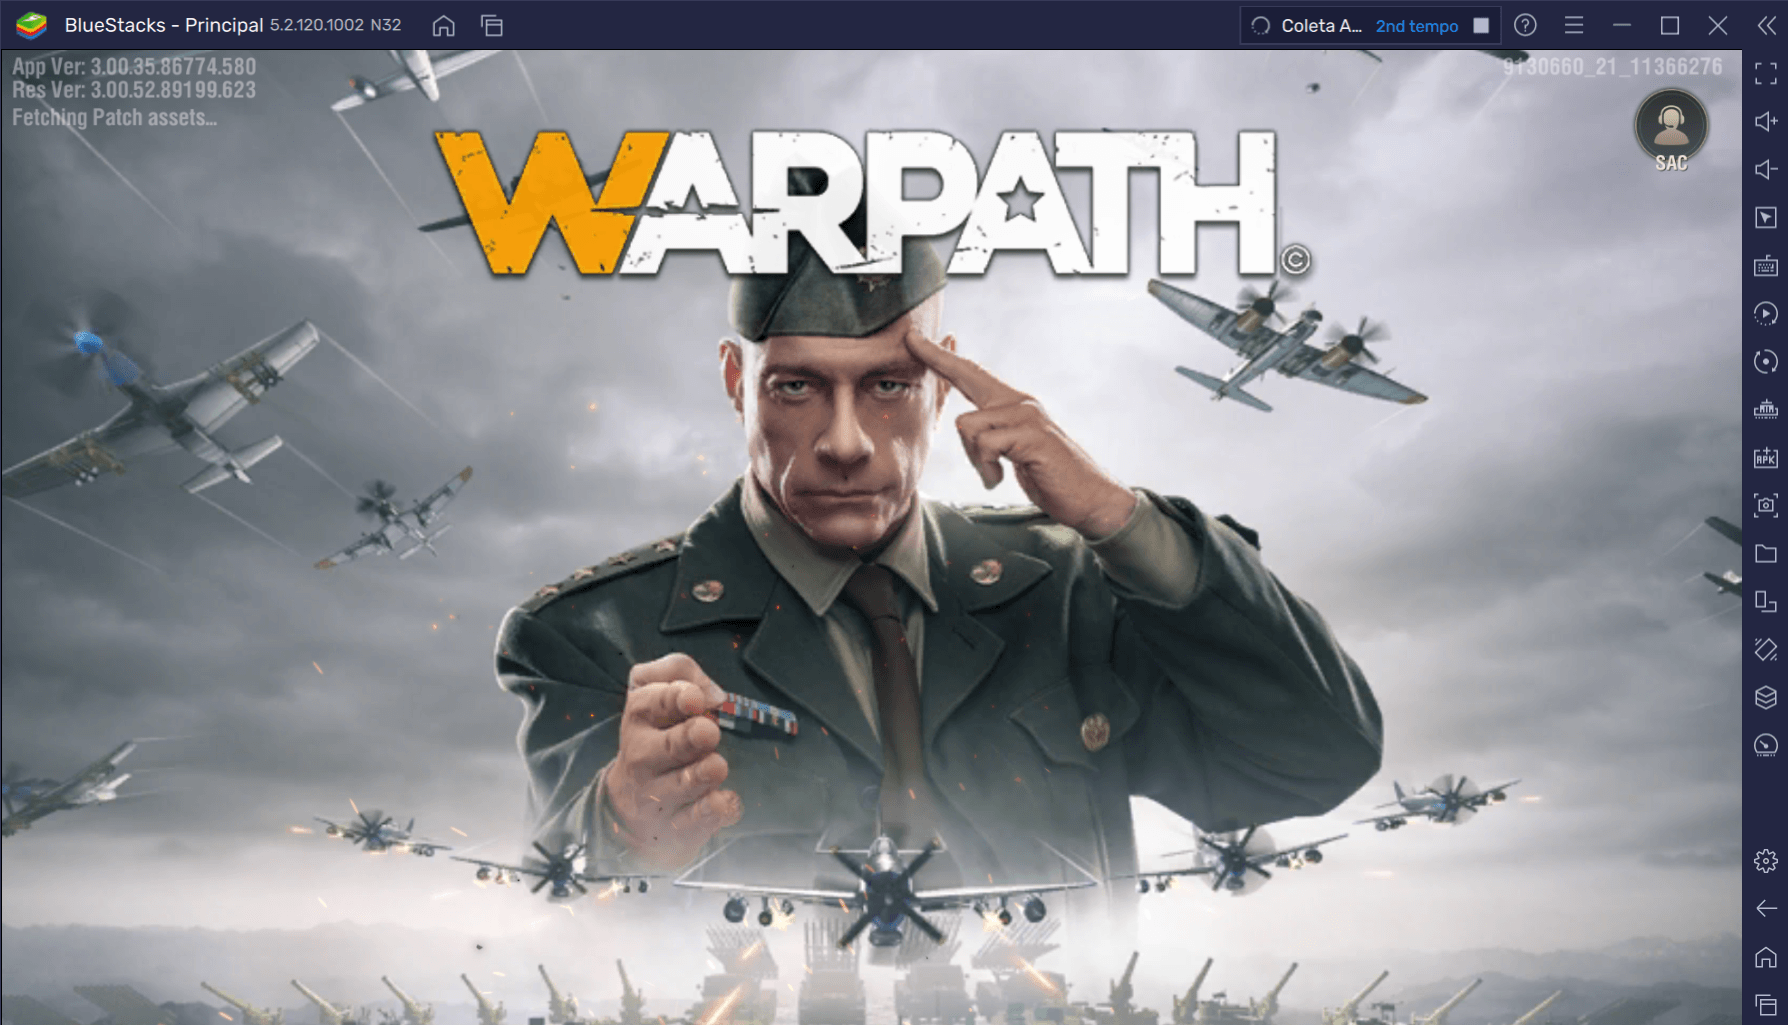 Como jogar Warpath no PC com BlueStacks